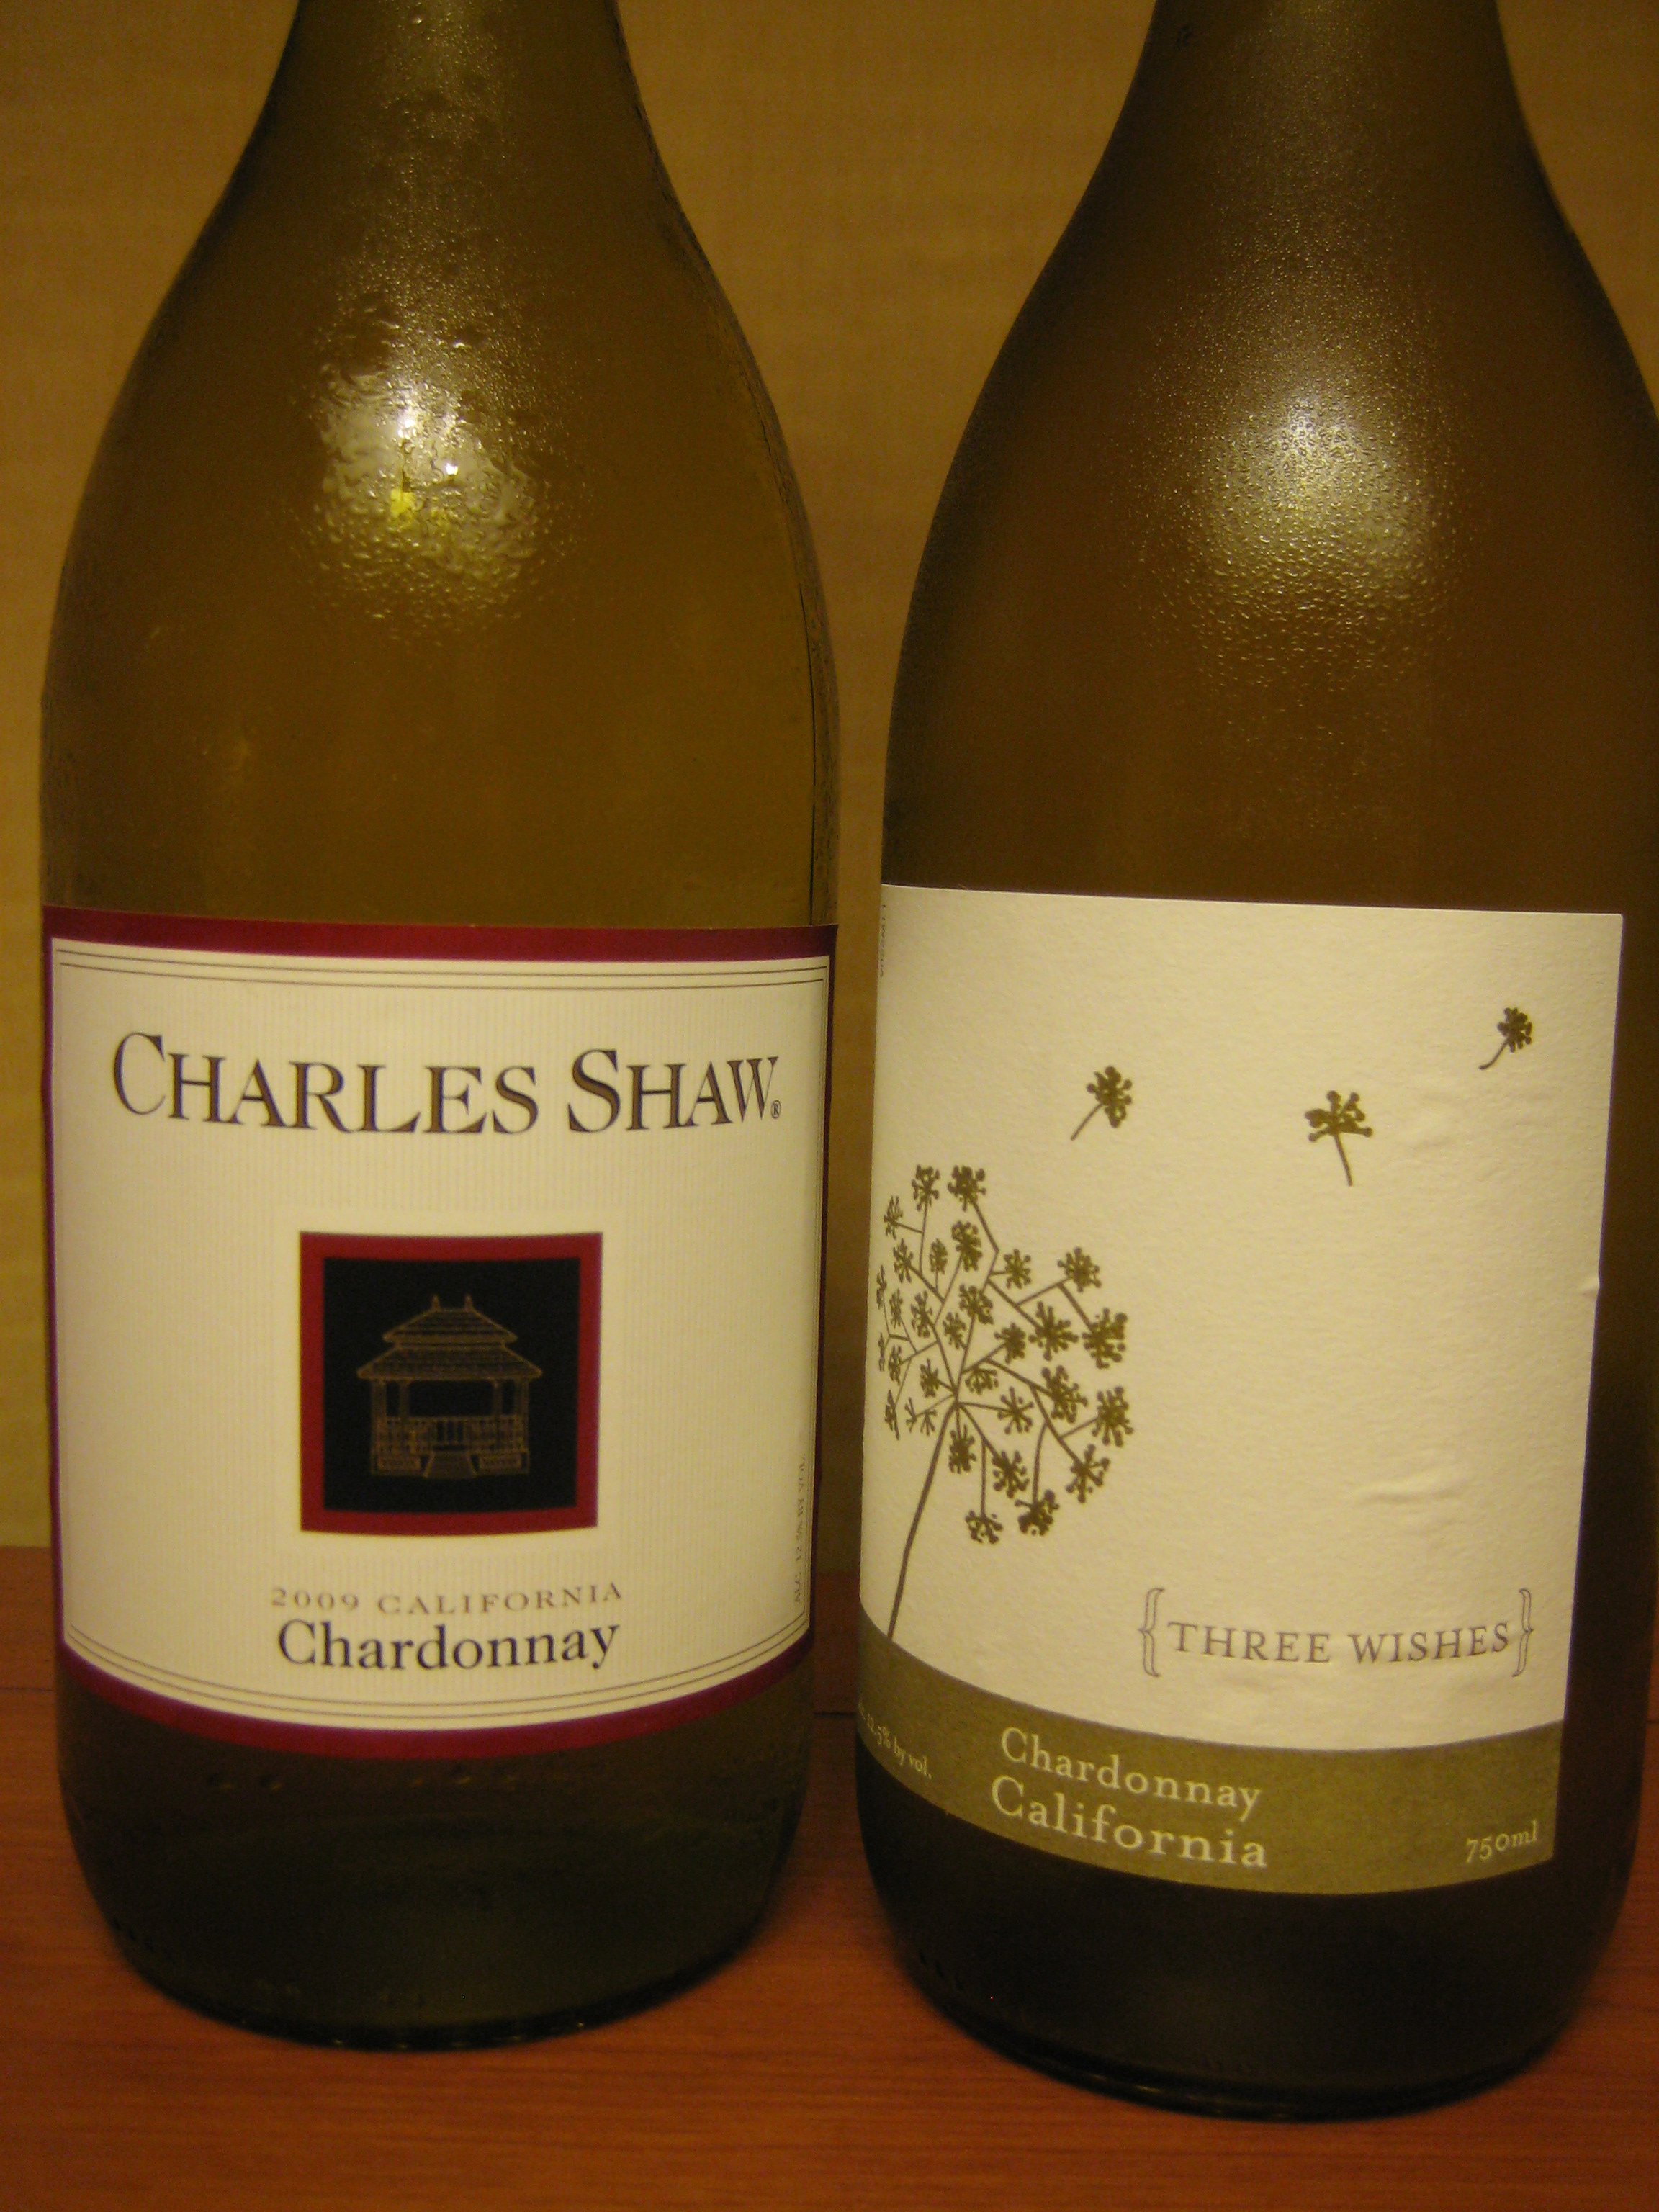 Three Wishes Wine Whole Foods